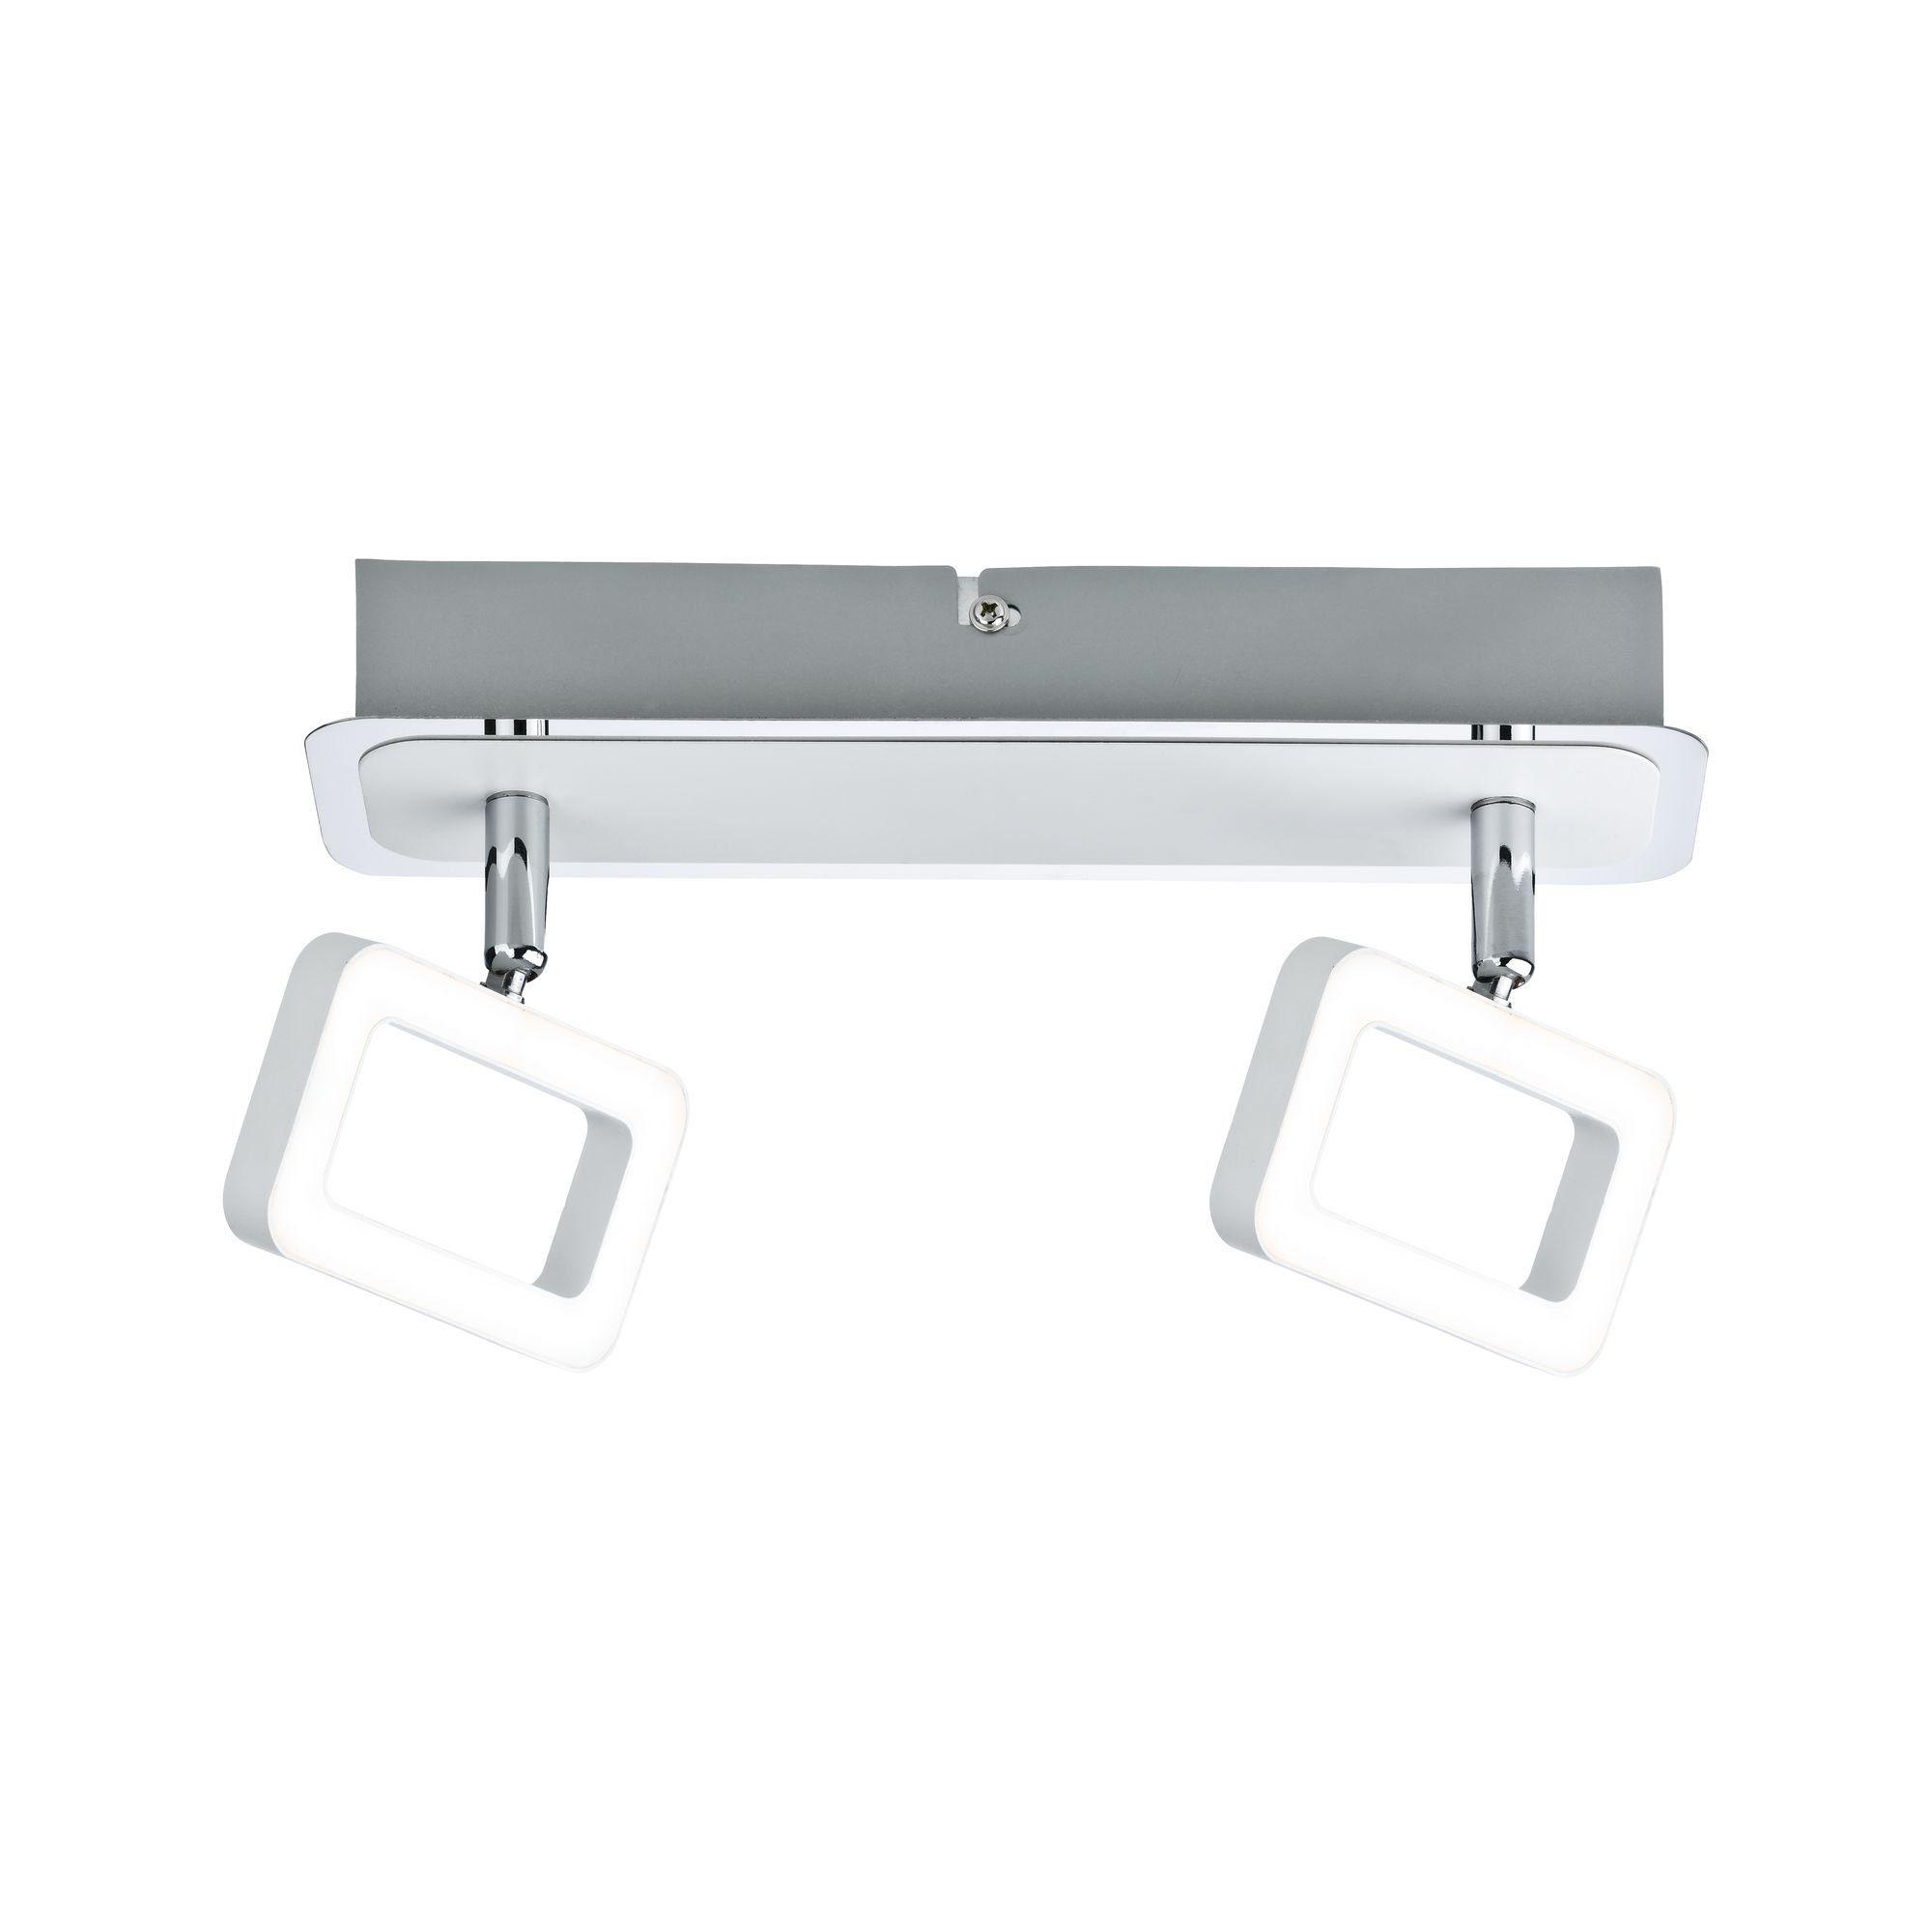 Paulmann LED Deckenleuchte Spot Weiß/Chrom Frame inkl. Leuchtmittel 2x4,5W, 1 St., Warmweiß